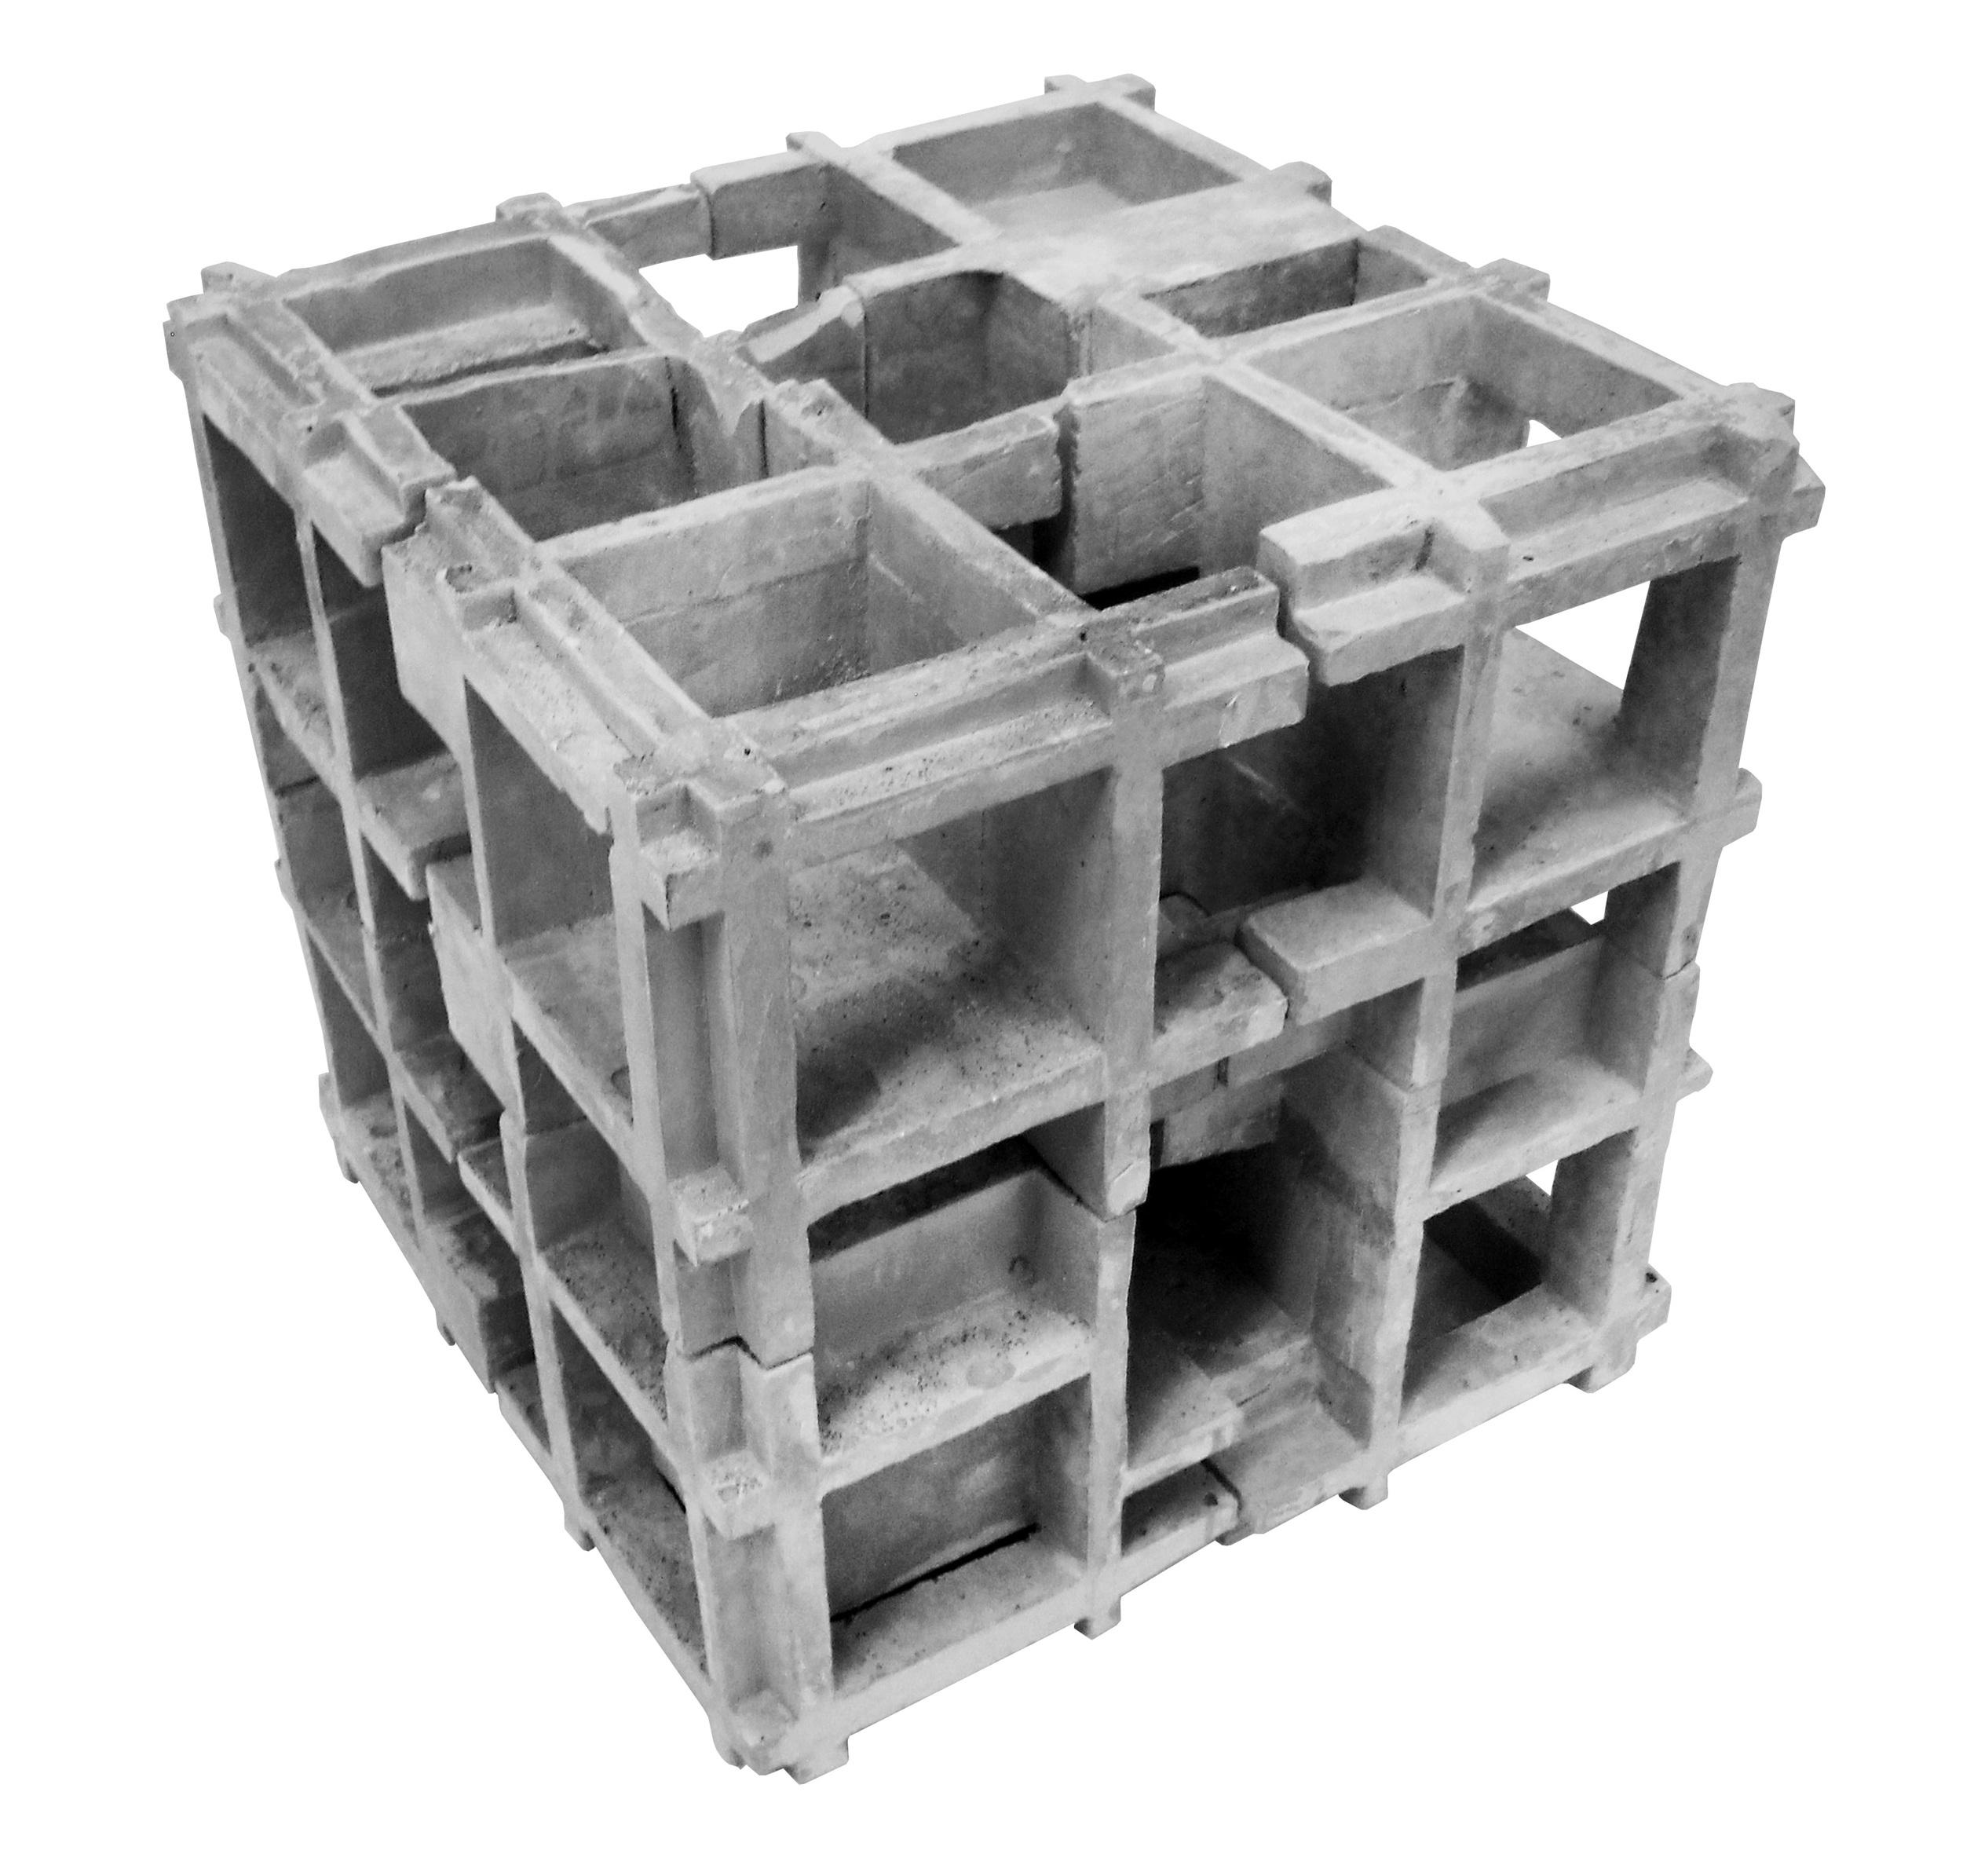 Cube Photoshop.jpg